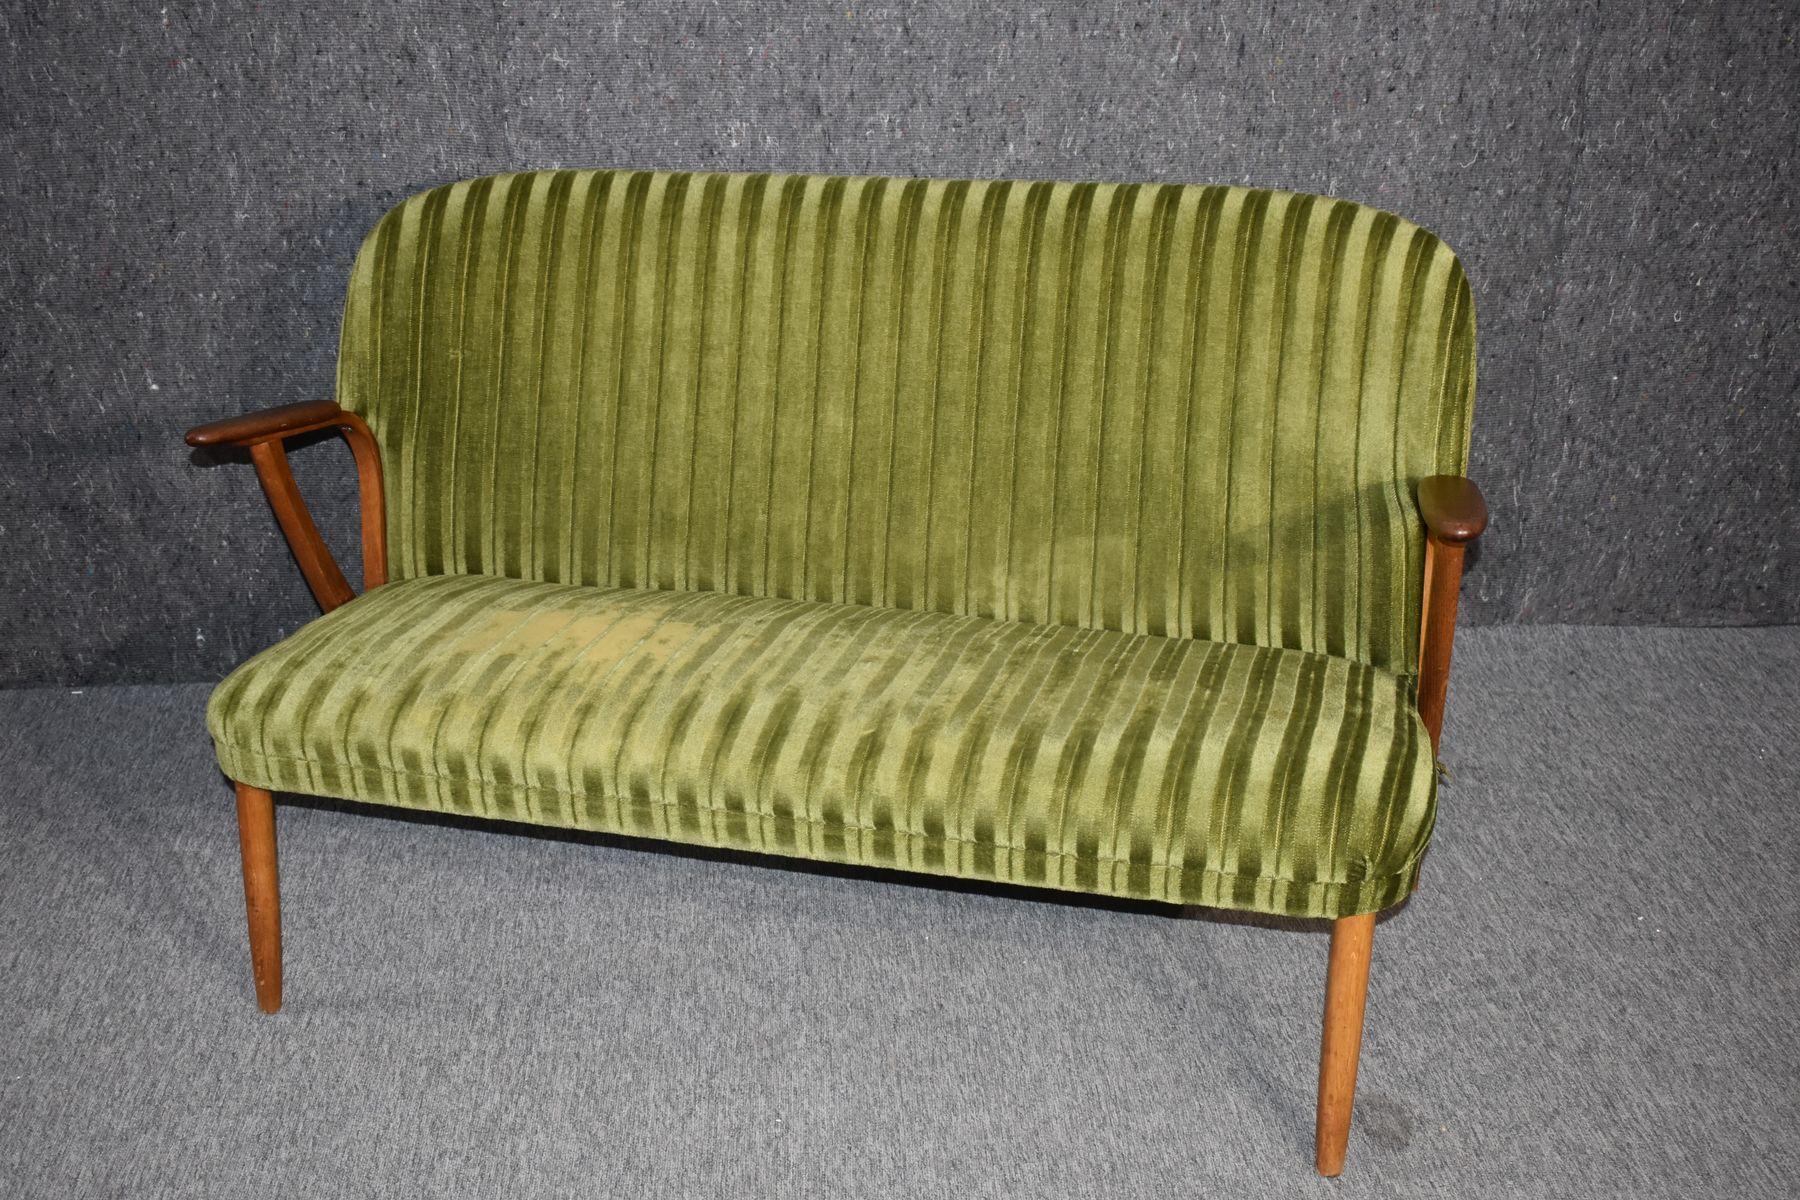 Danish Mid Century Modern 2 Seater Green Teak Sofa, 1960s